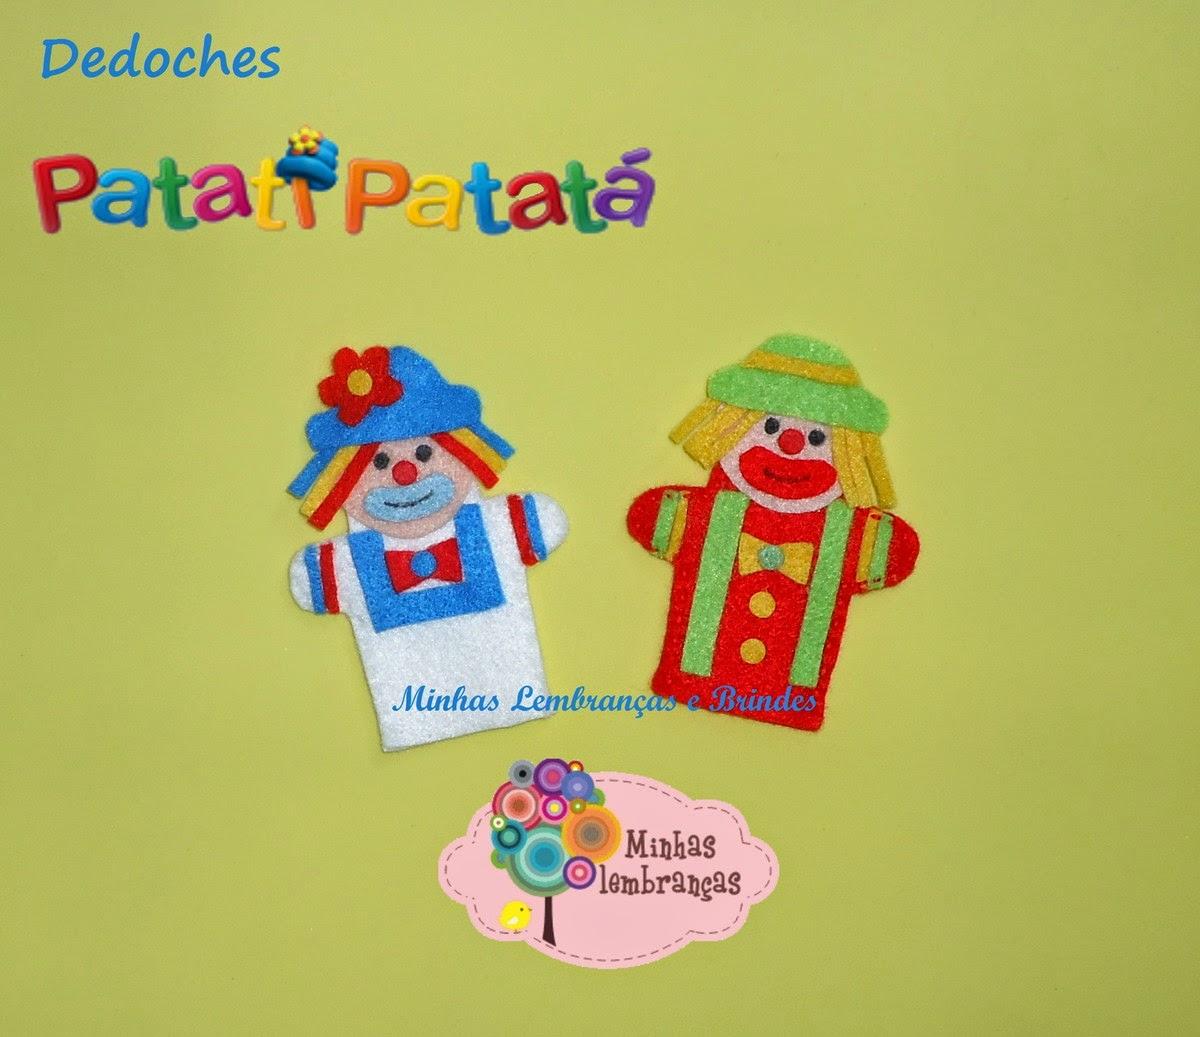 patati patatá-palhaços-feltro-dedoches-lembrancinha-brindes-festa-infantil